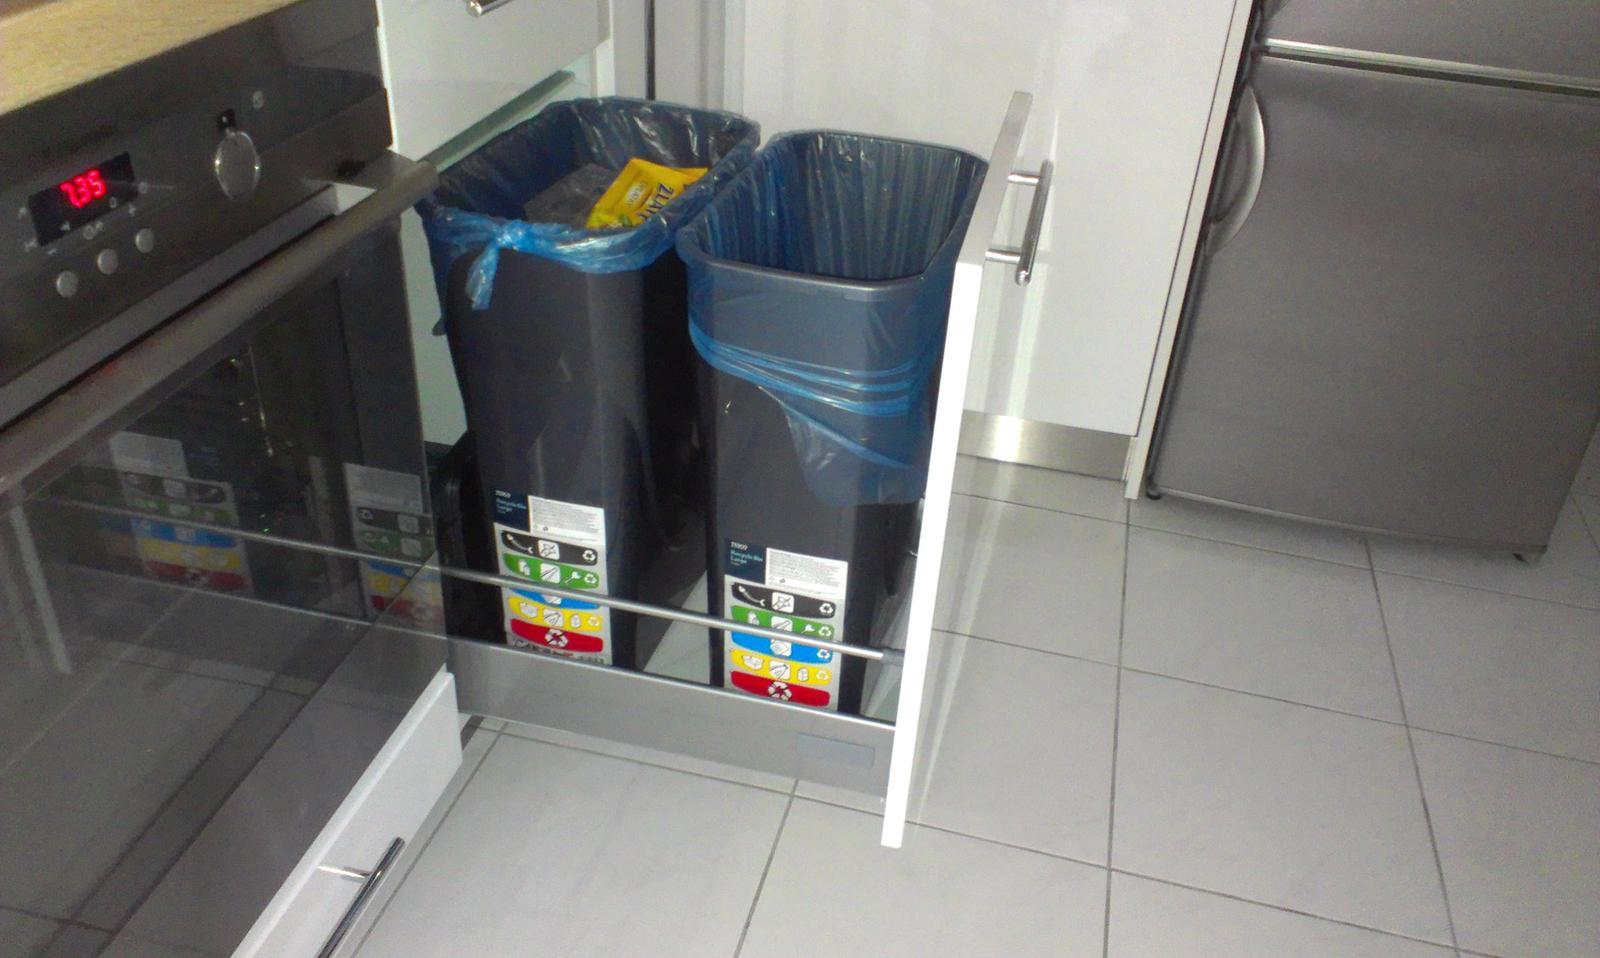 Odpadkovy kos do kuchyne - Obrázok č. 1